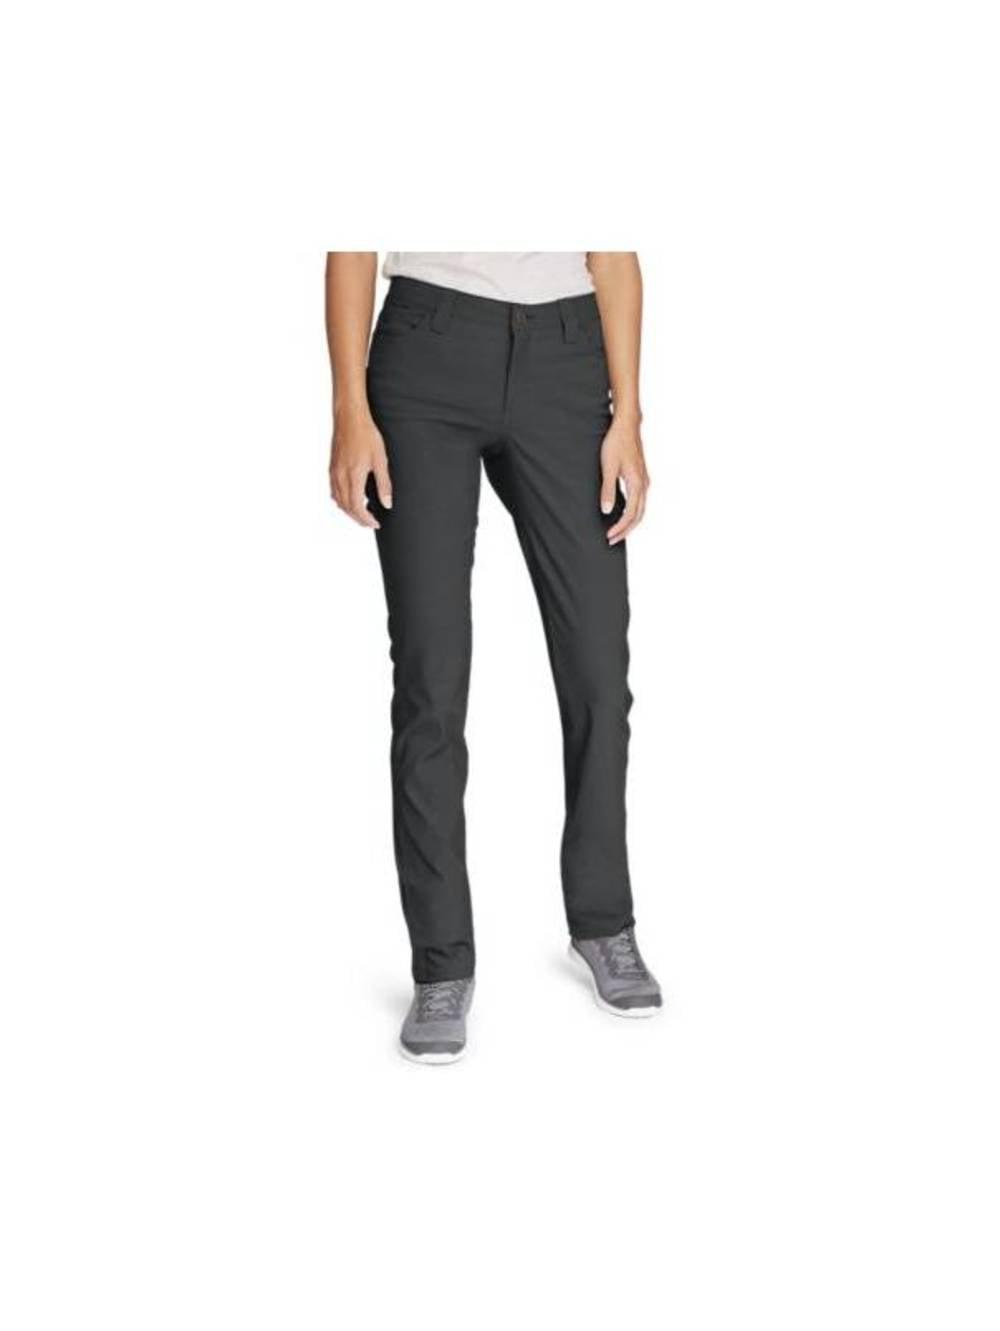 Eddie Bauer Womens Horizon Guide 5-Pocket Slim Straight Pants